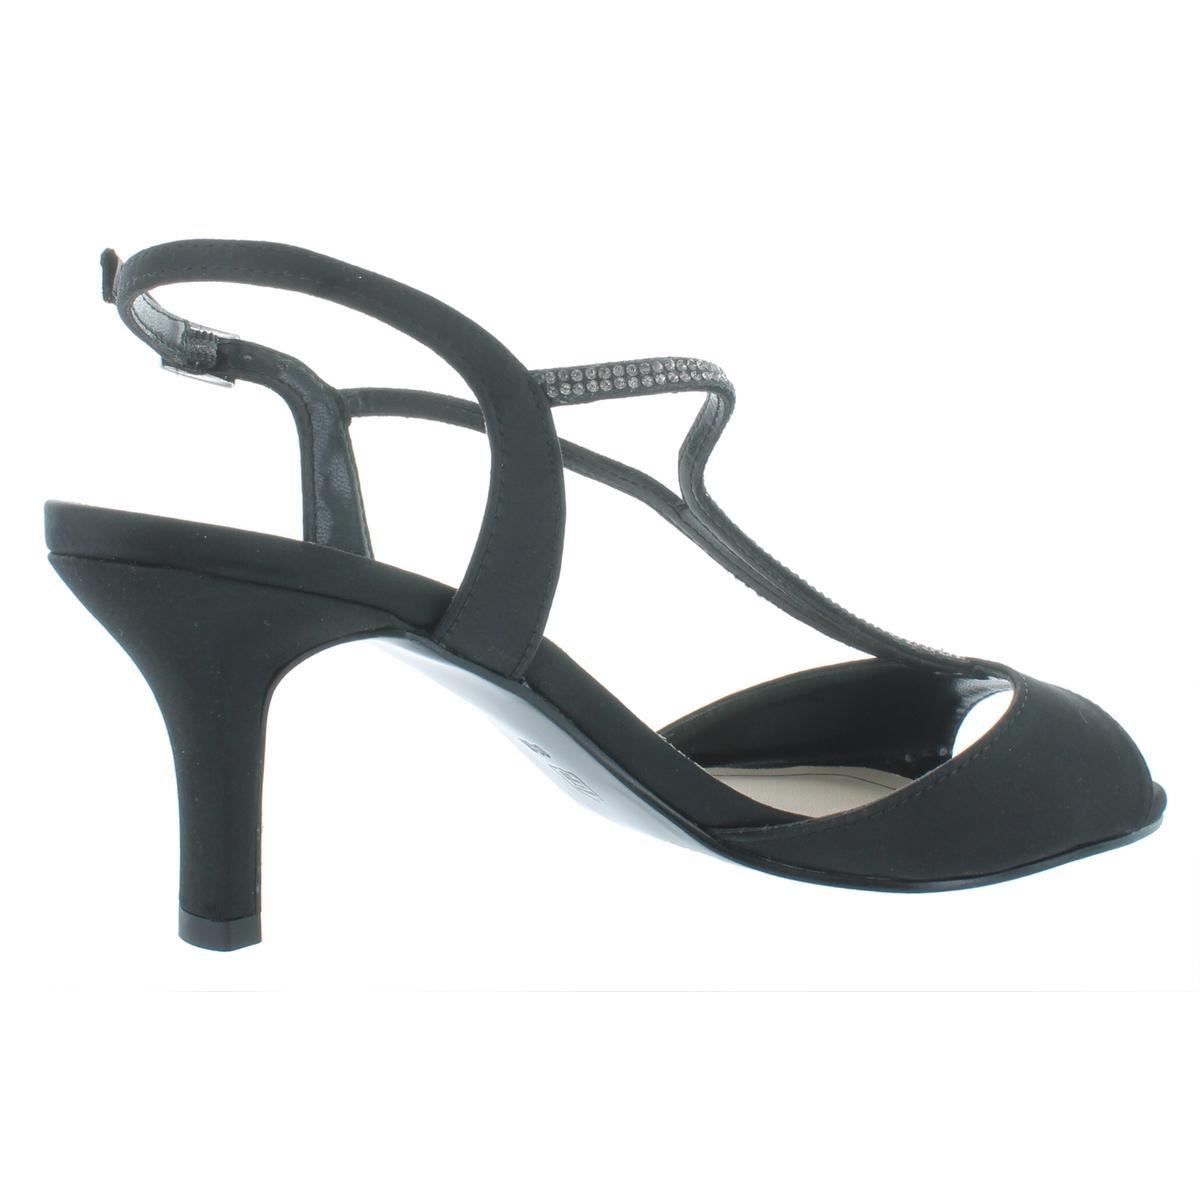 Caparros-Womens-Delicia-Rhinestone-Open-Toe-Evening-Heels-Shoes-BHFO-9353 thumbnail 4